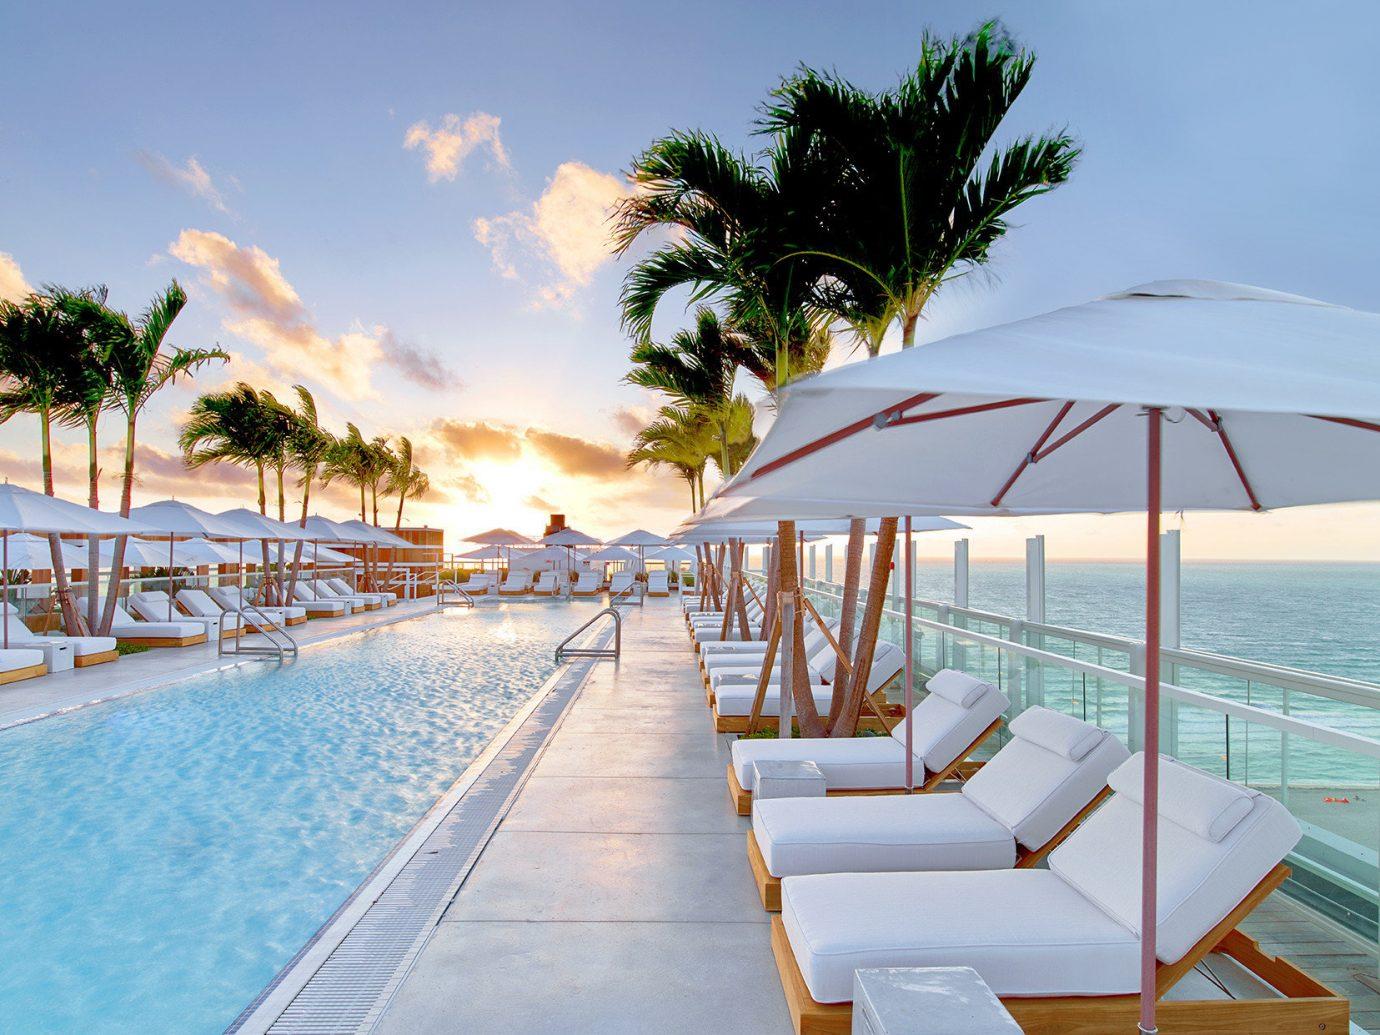 Most Romantic Hotels in Miami